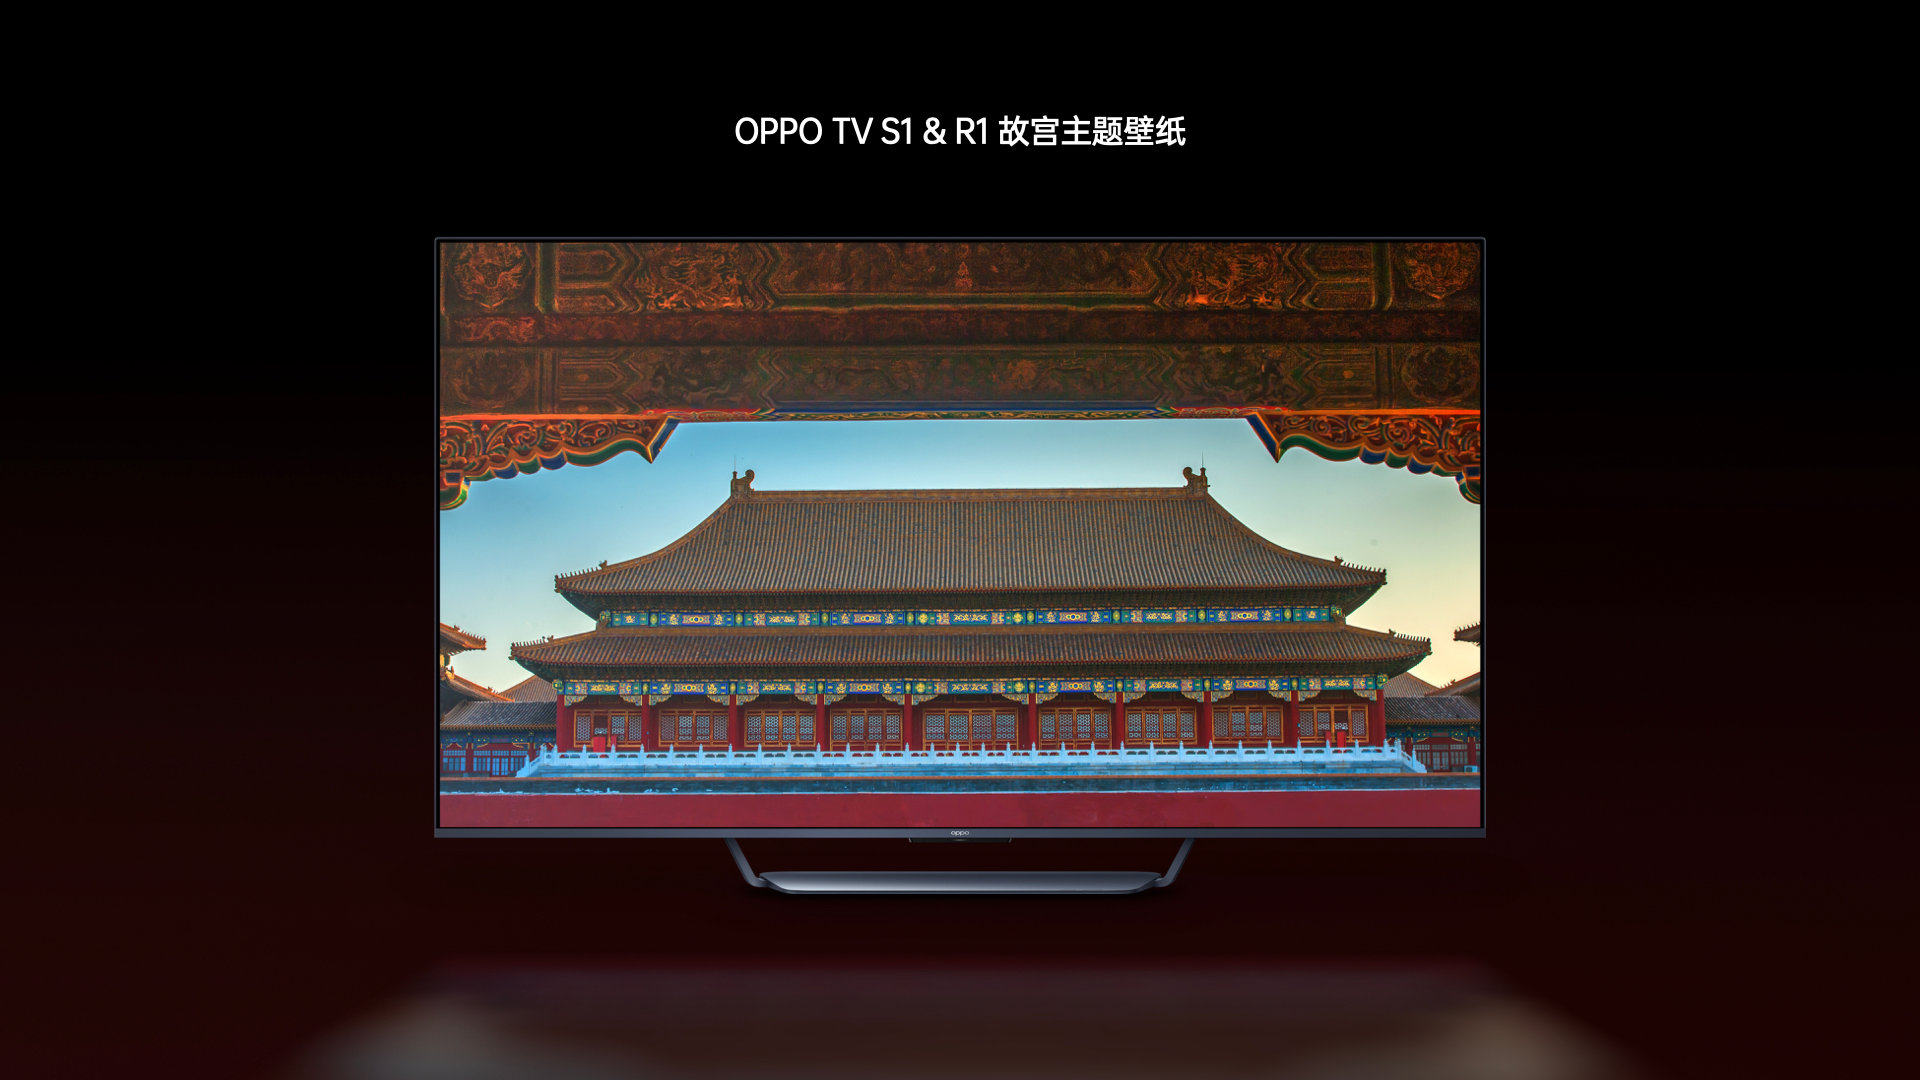 OPPO故宫系列来了!OPPO电视推出故宫壁纸主题